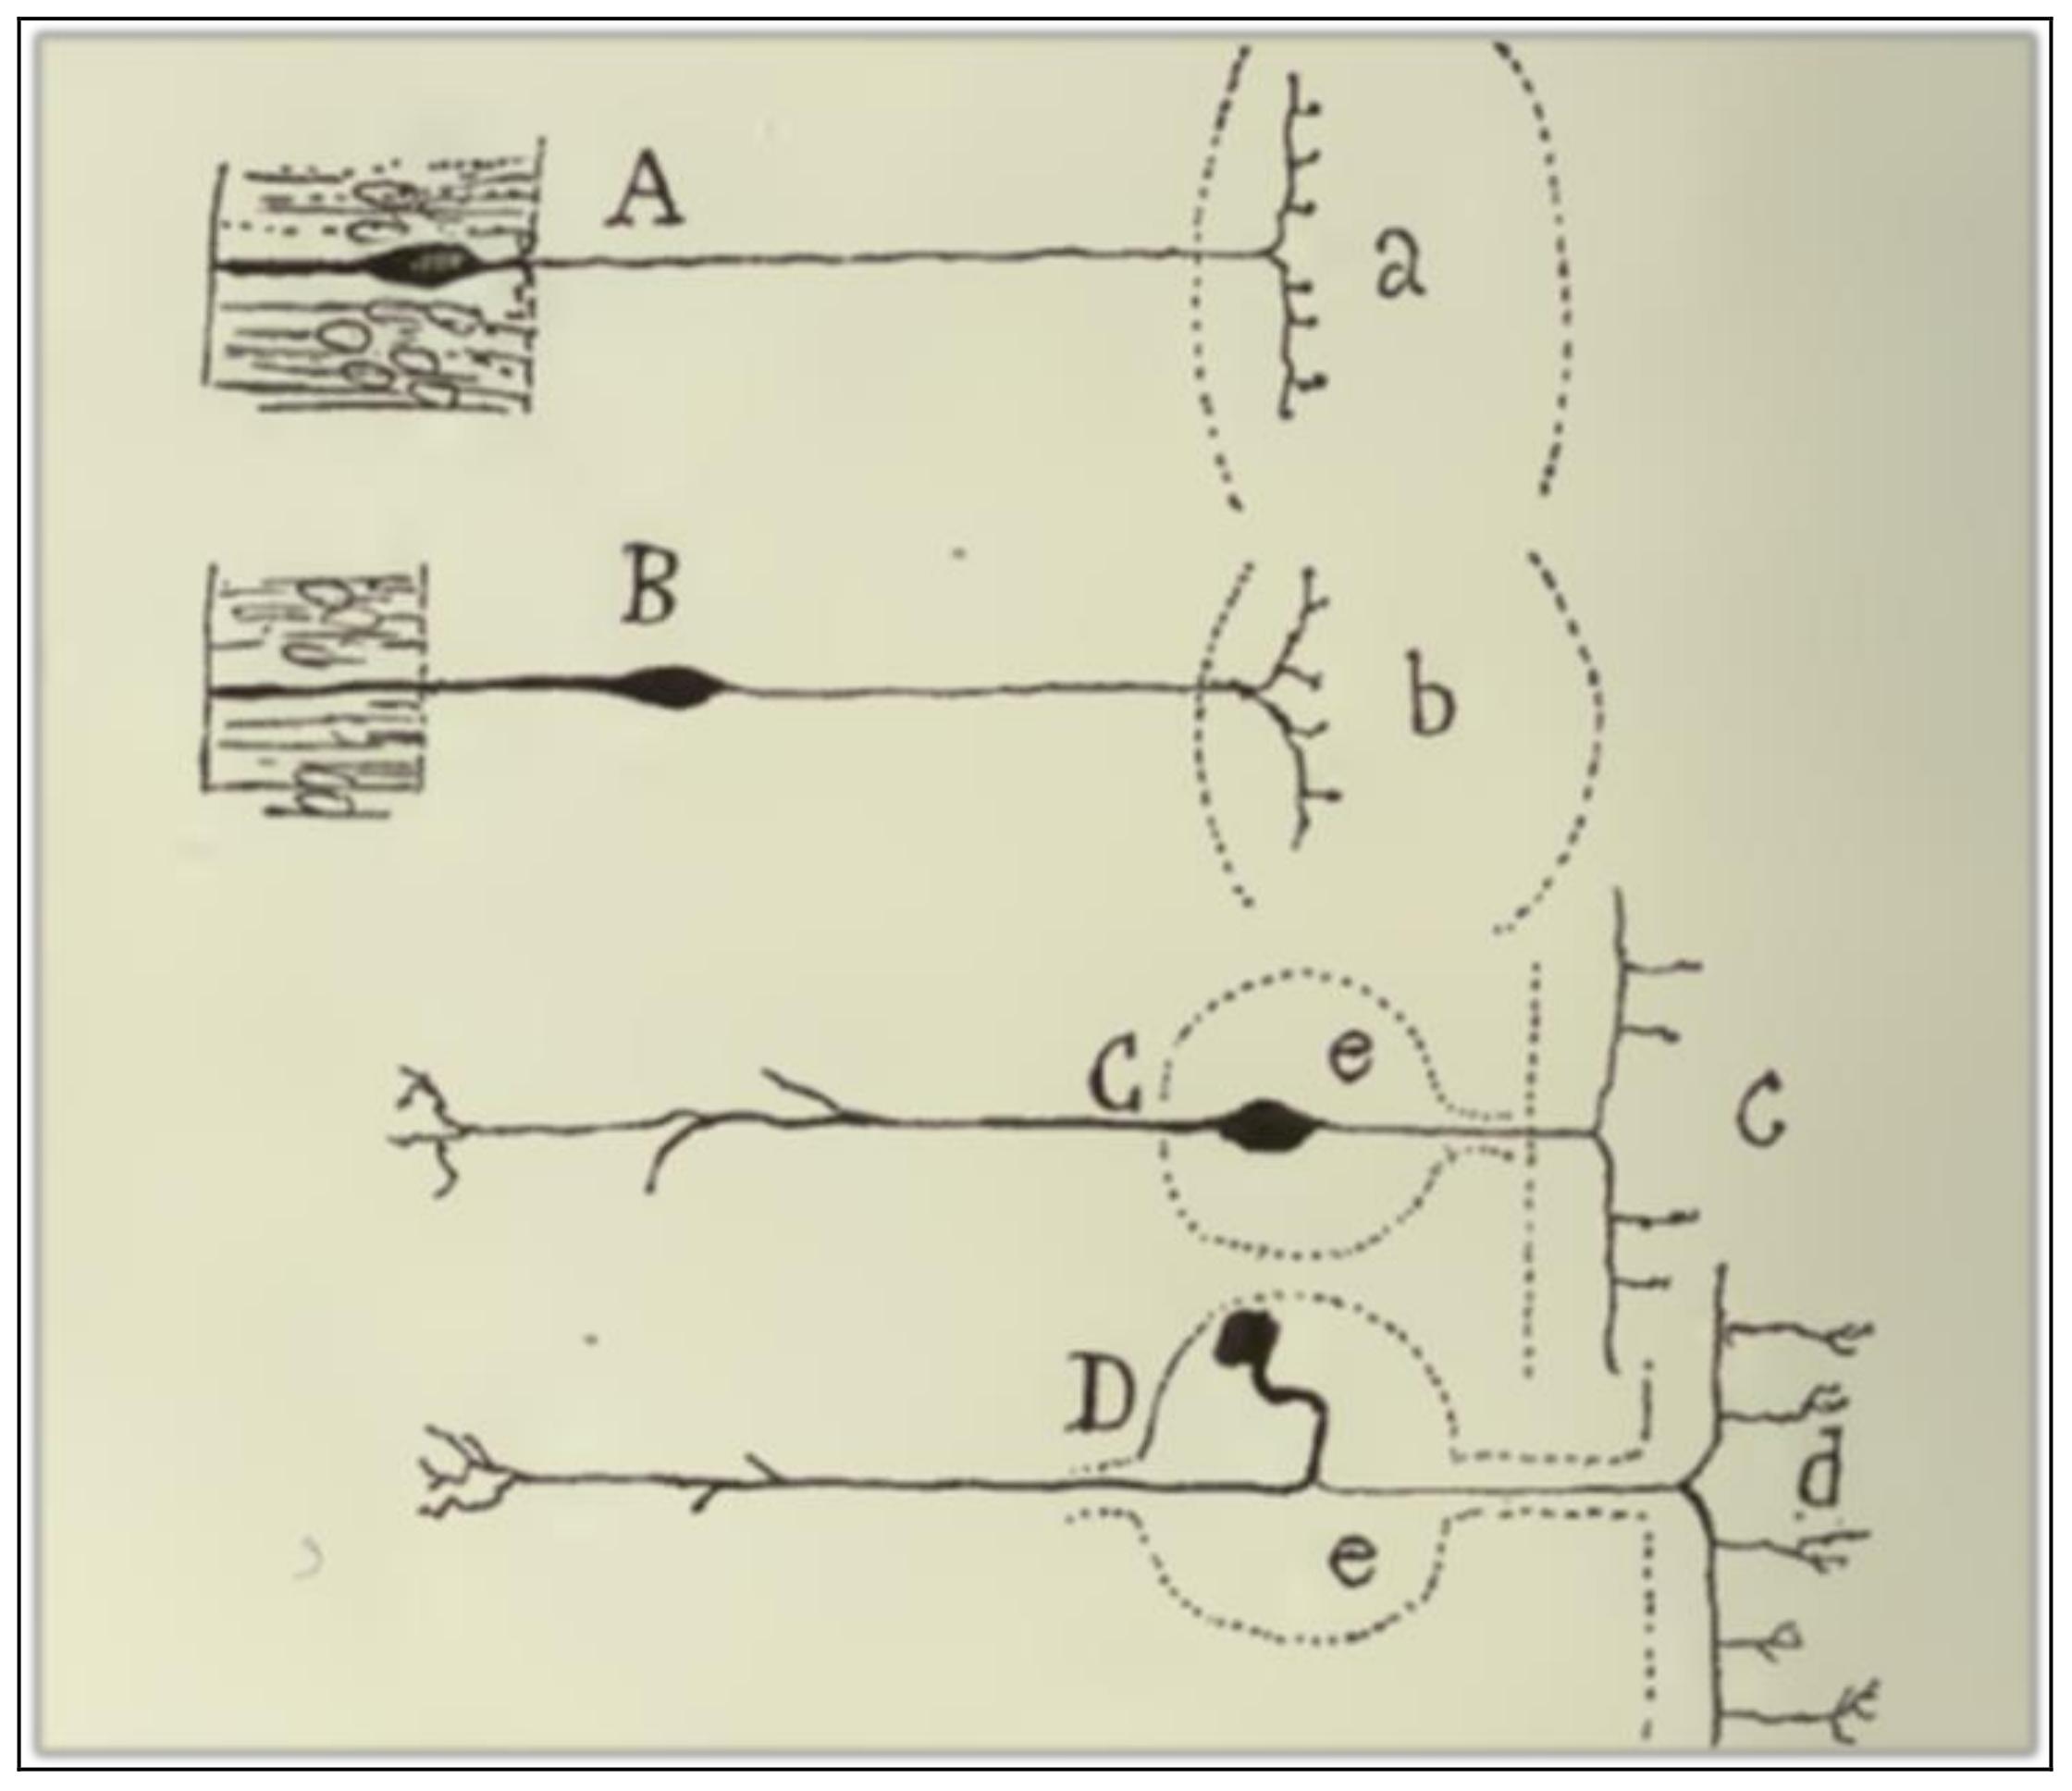 neurophysiology of nerve impulses frog subjects answers